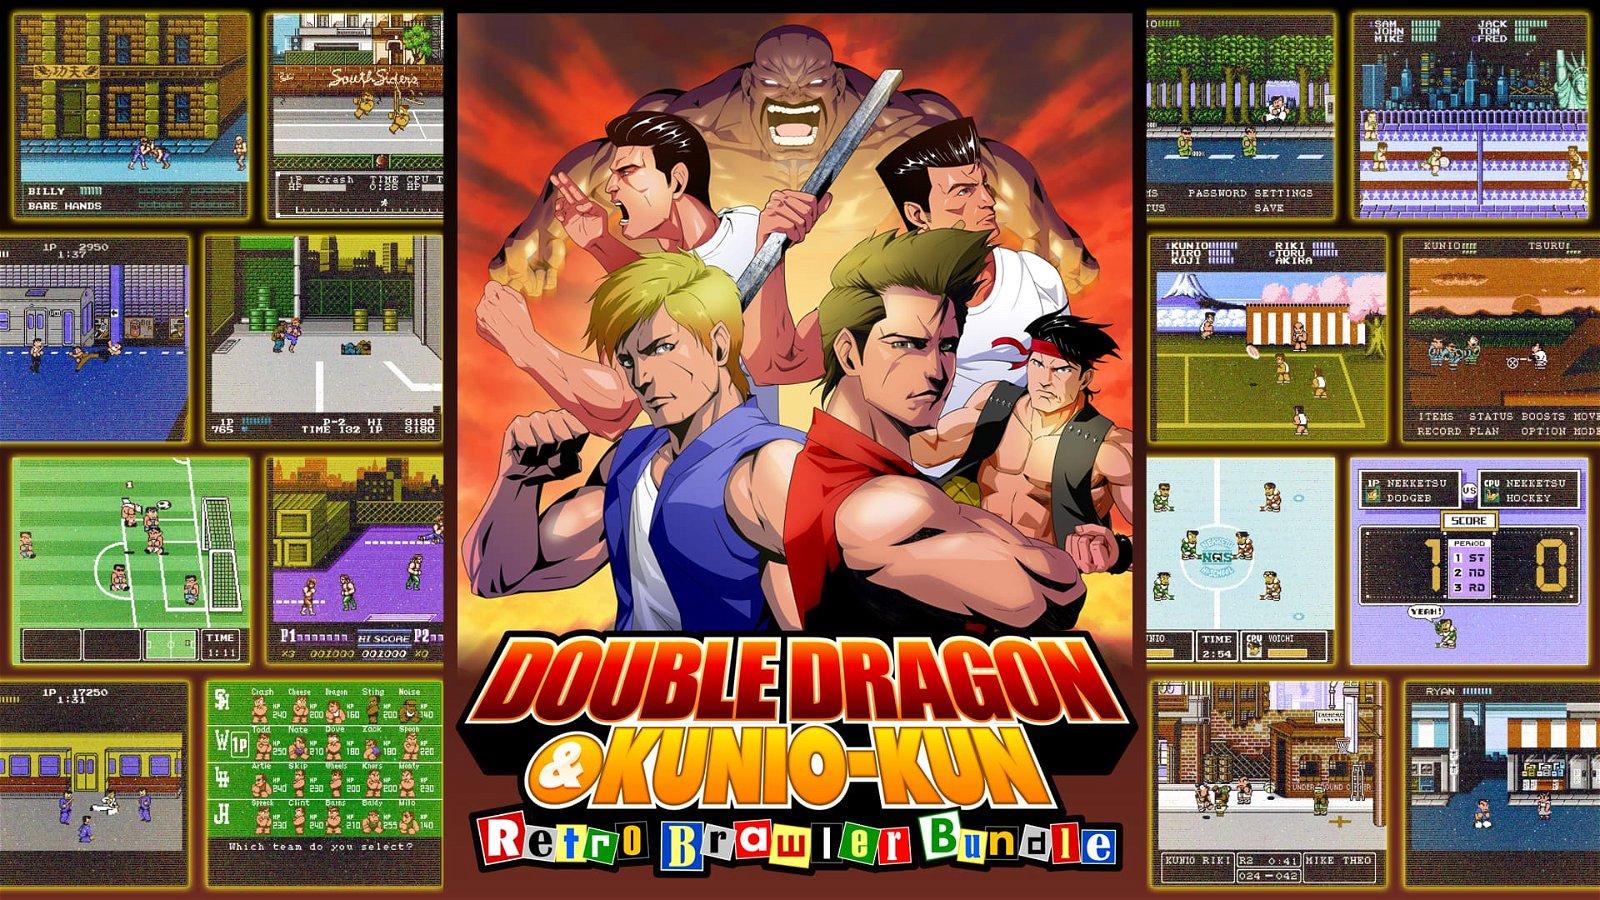 Double Dragon & Kunio-kun: Retro Brawler Bundle Review 1